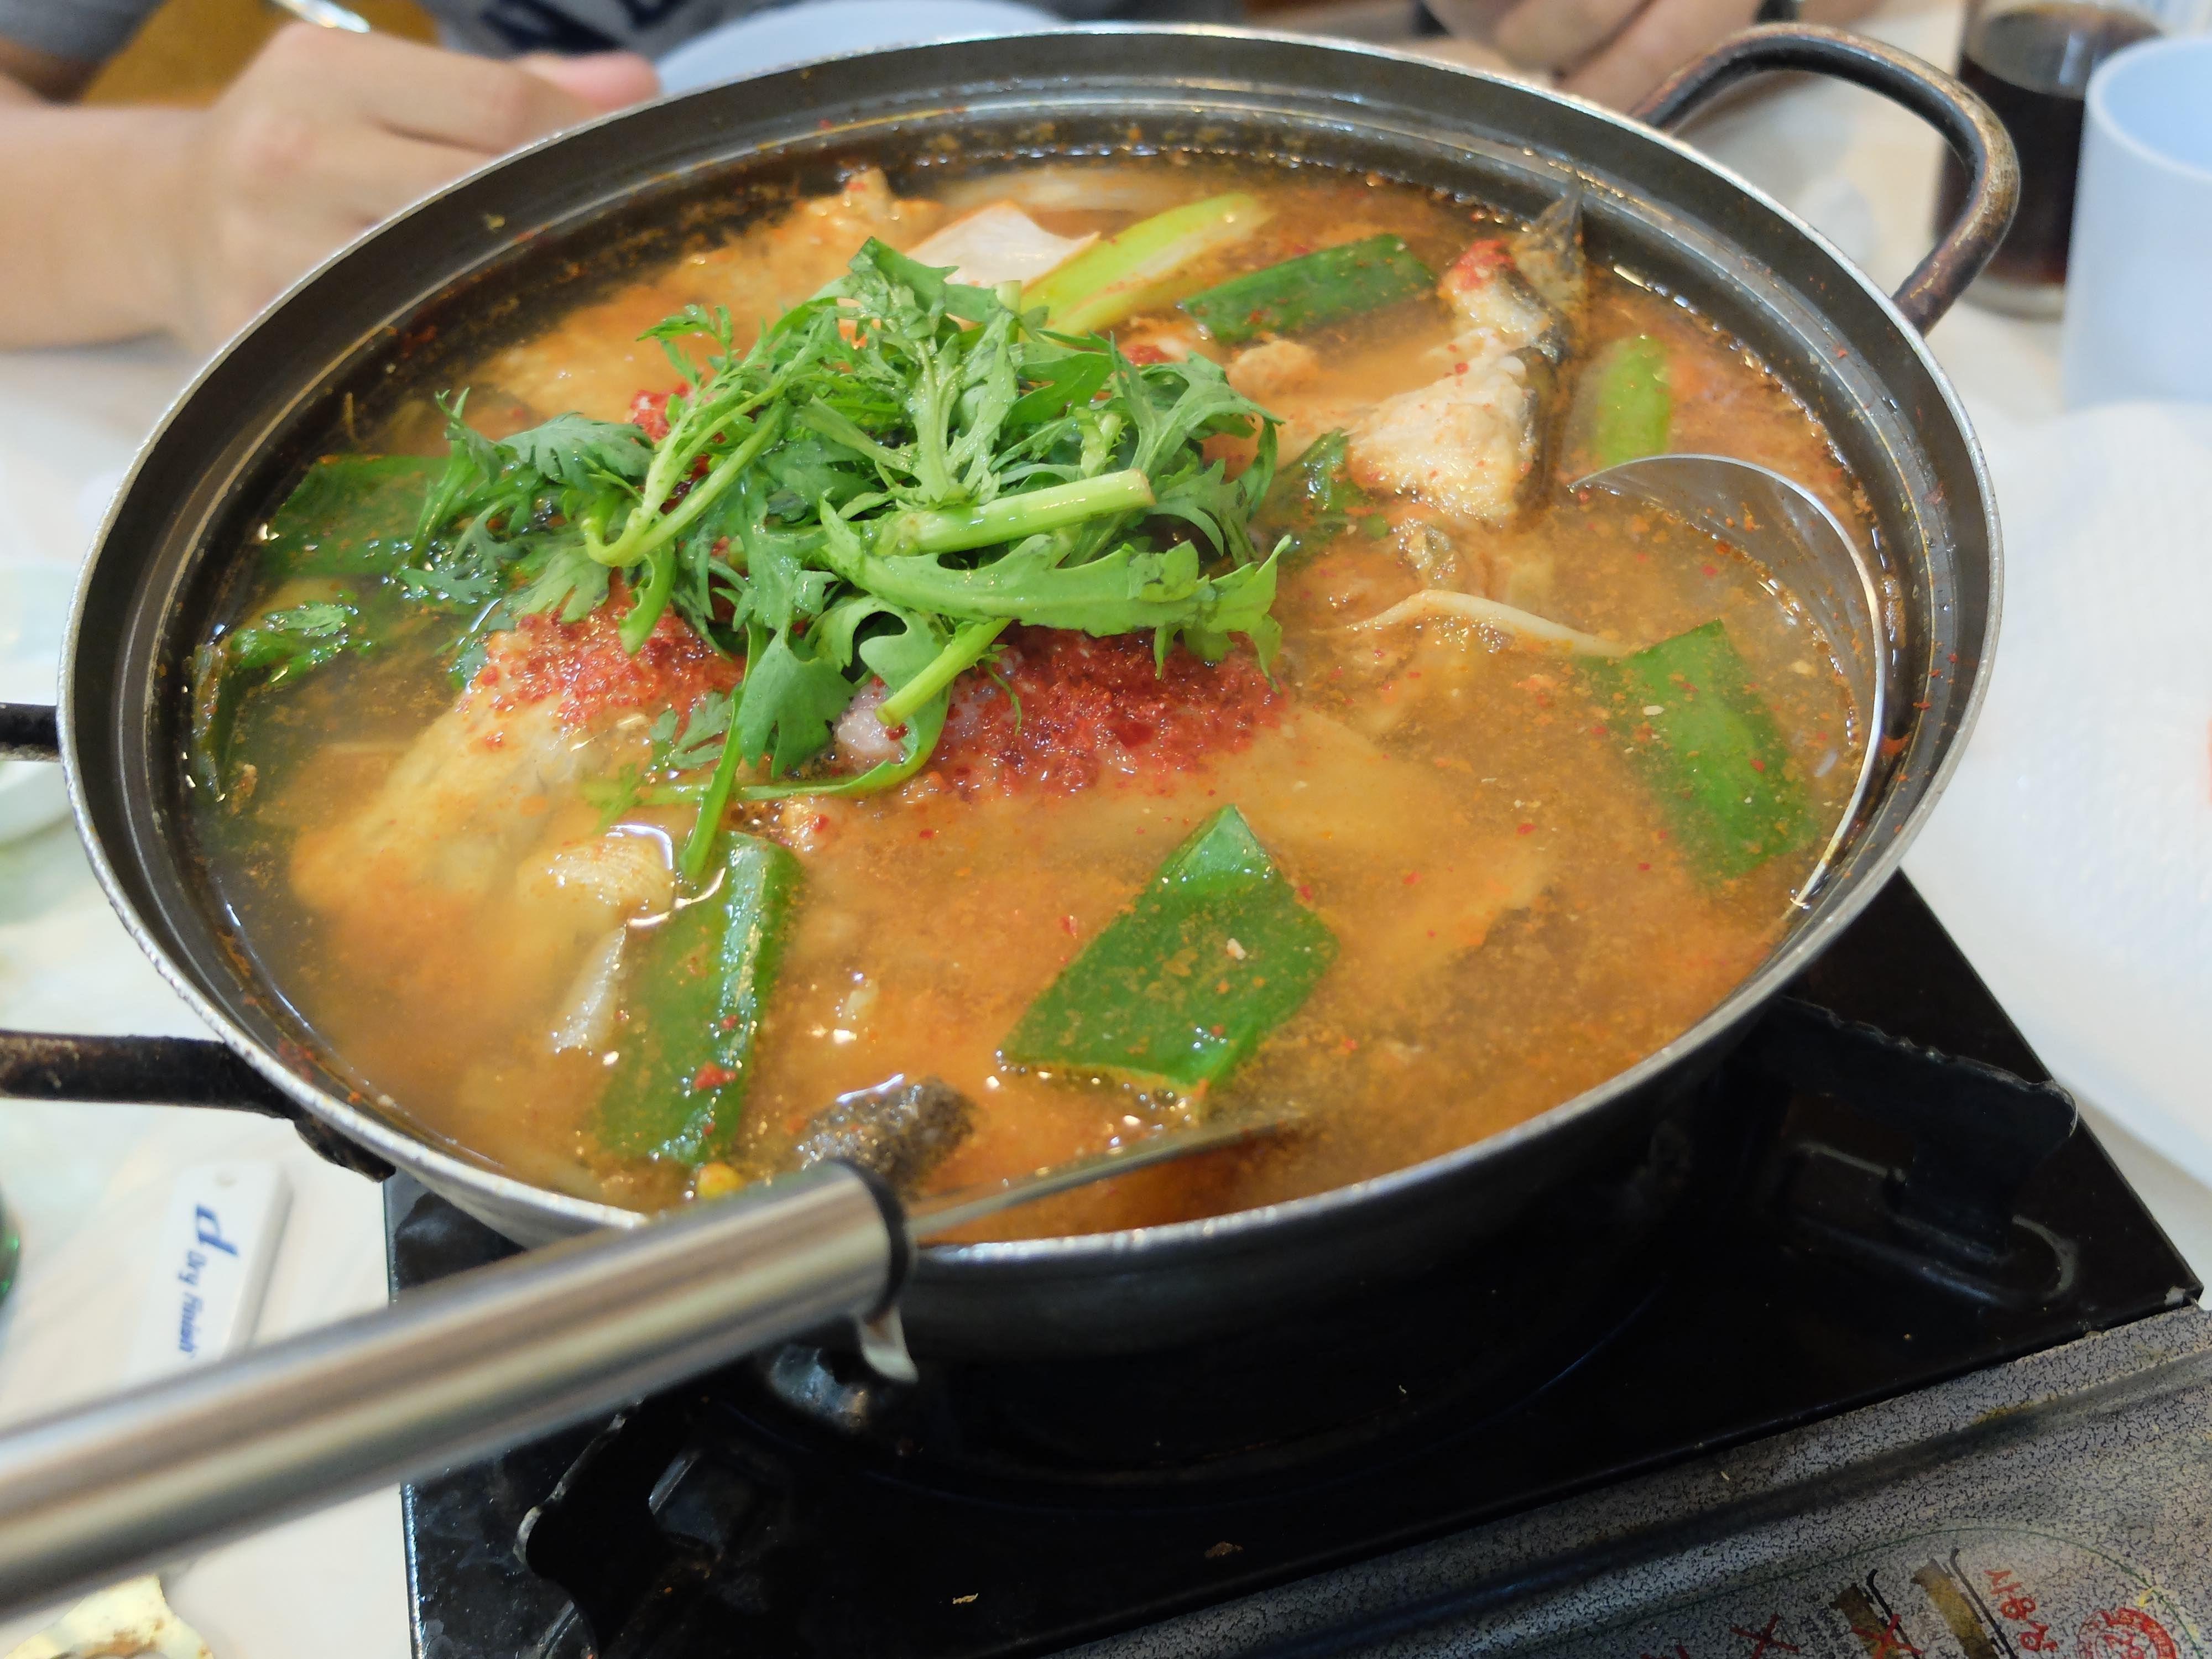 Top 3 Halal Korean Food In Korea Have Halal Will Travel Halal Food Blog For Muslim Travellers Korean Food Food Halal Recipes